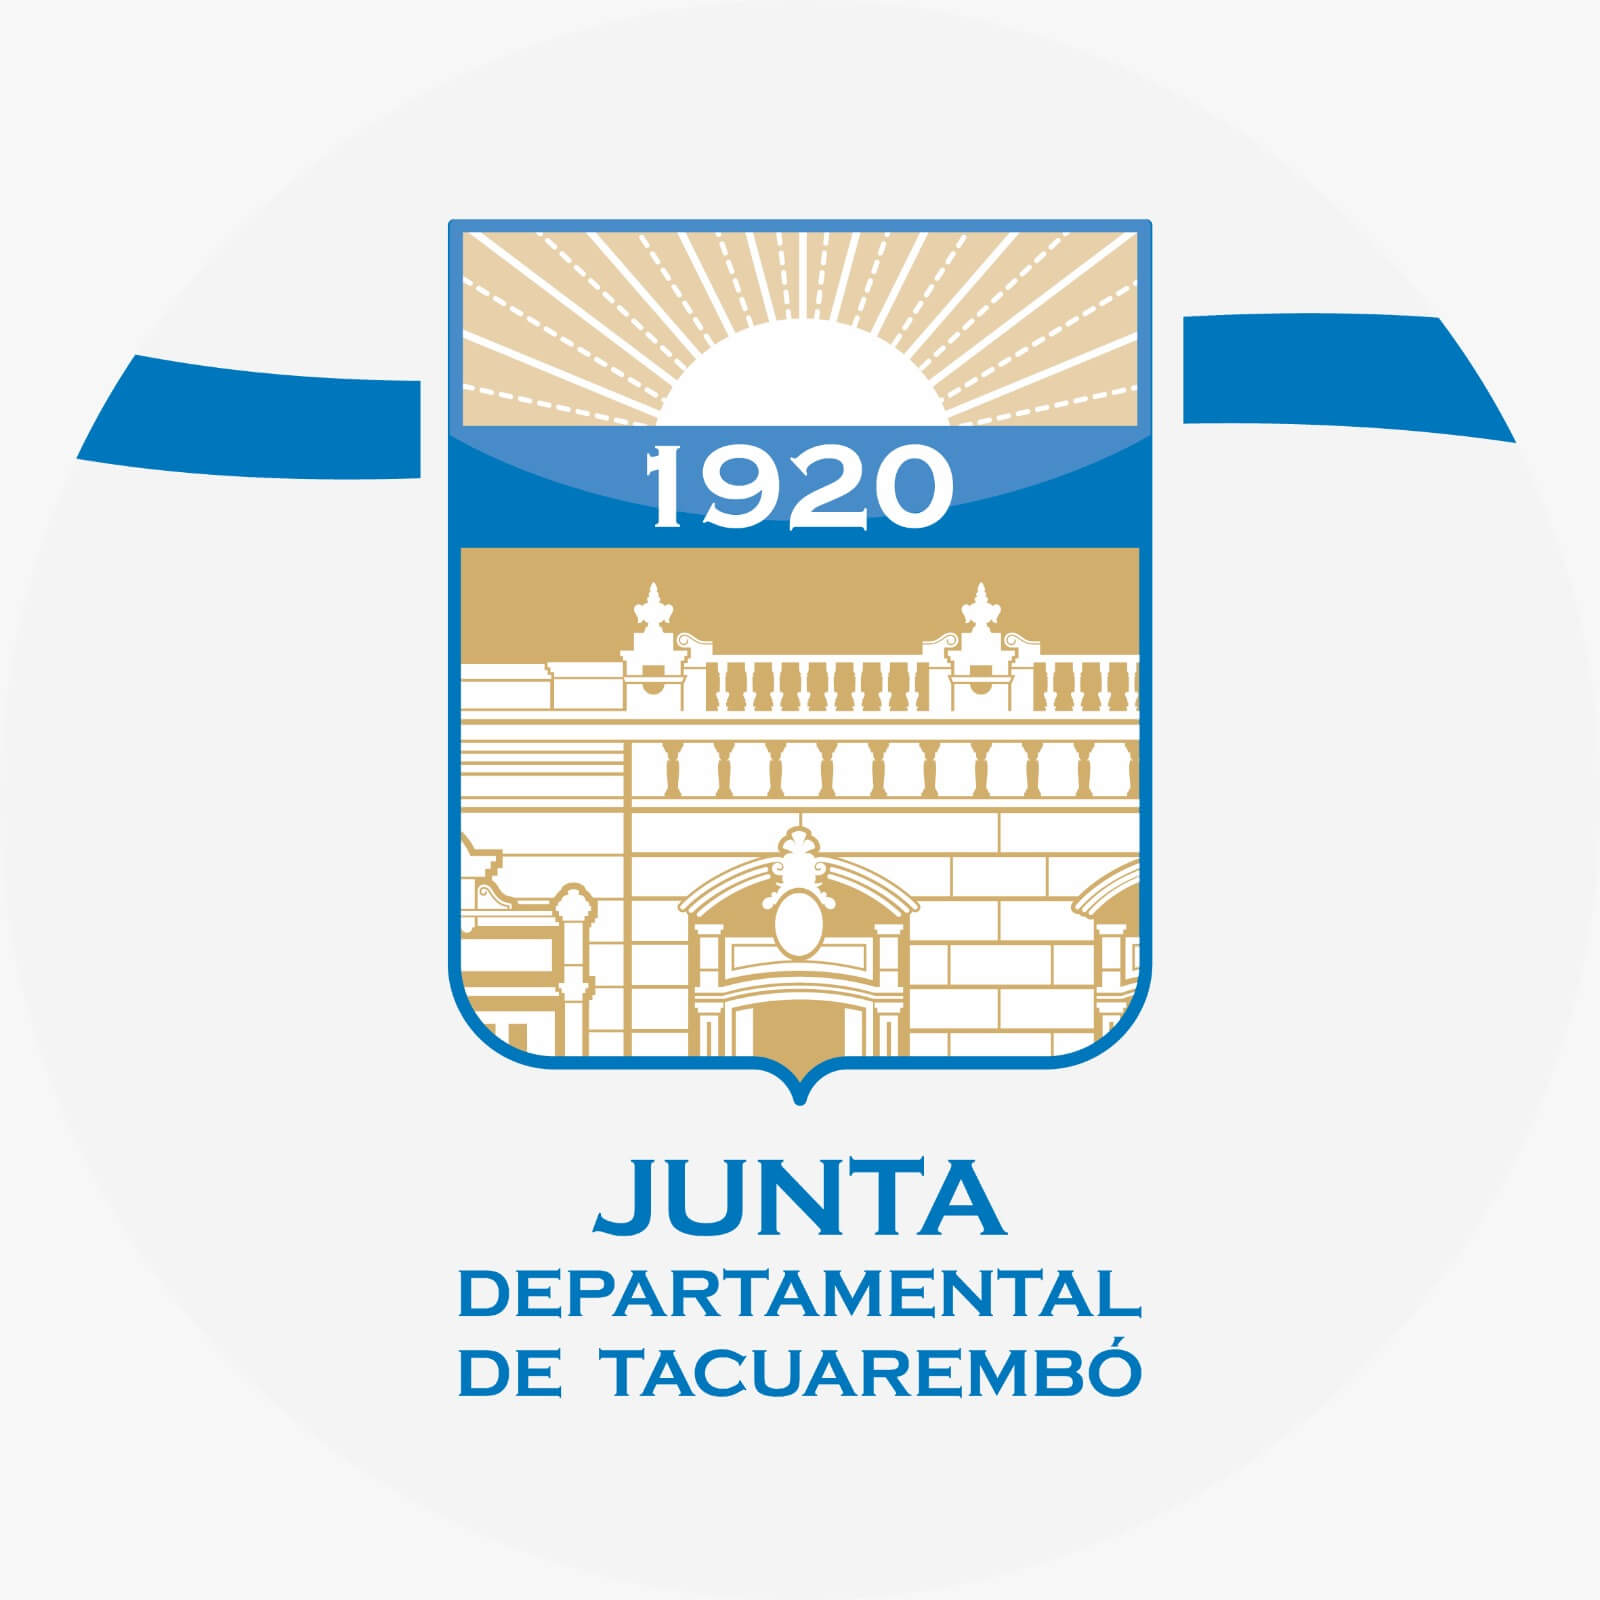 Junta Departamental de Tacuarembón